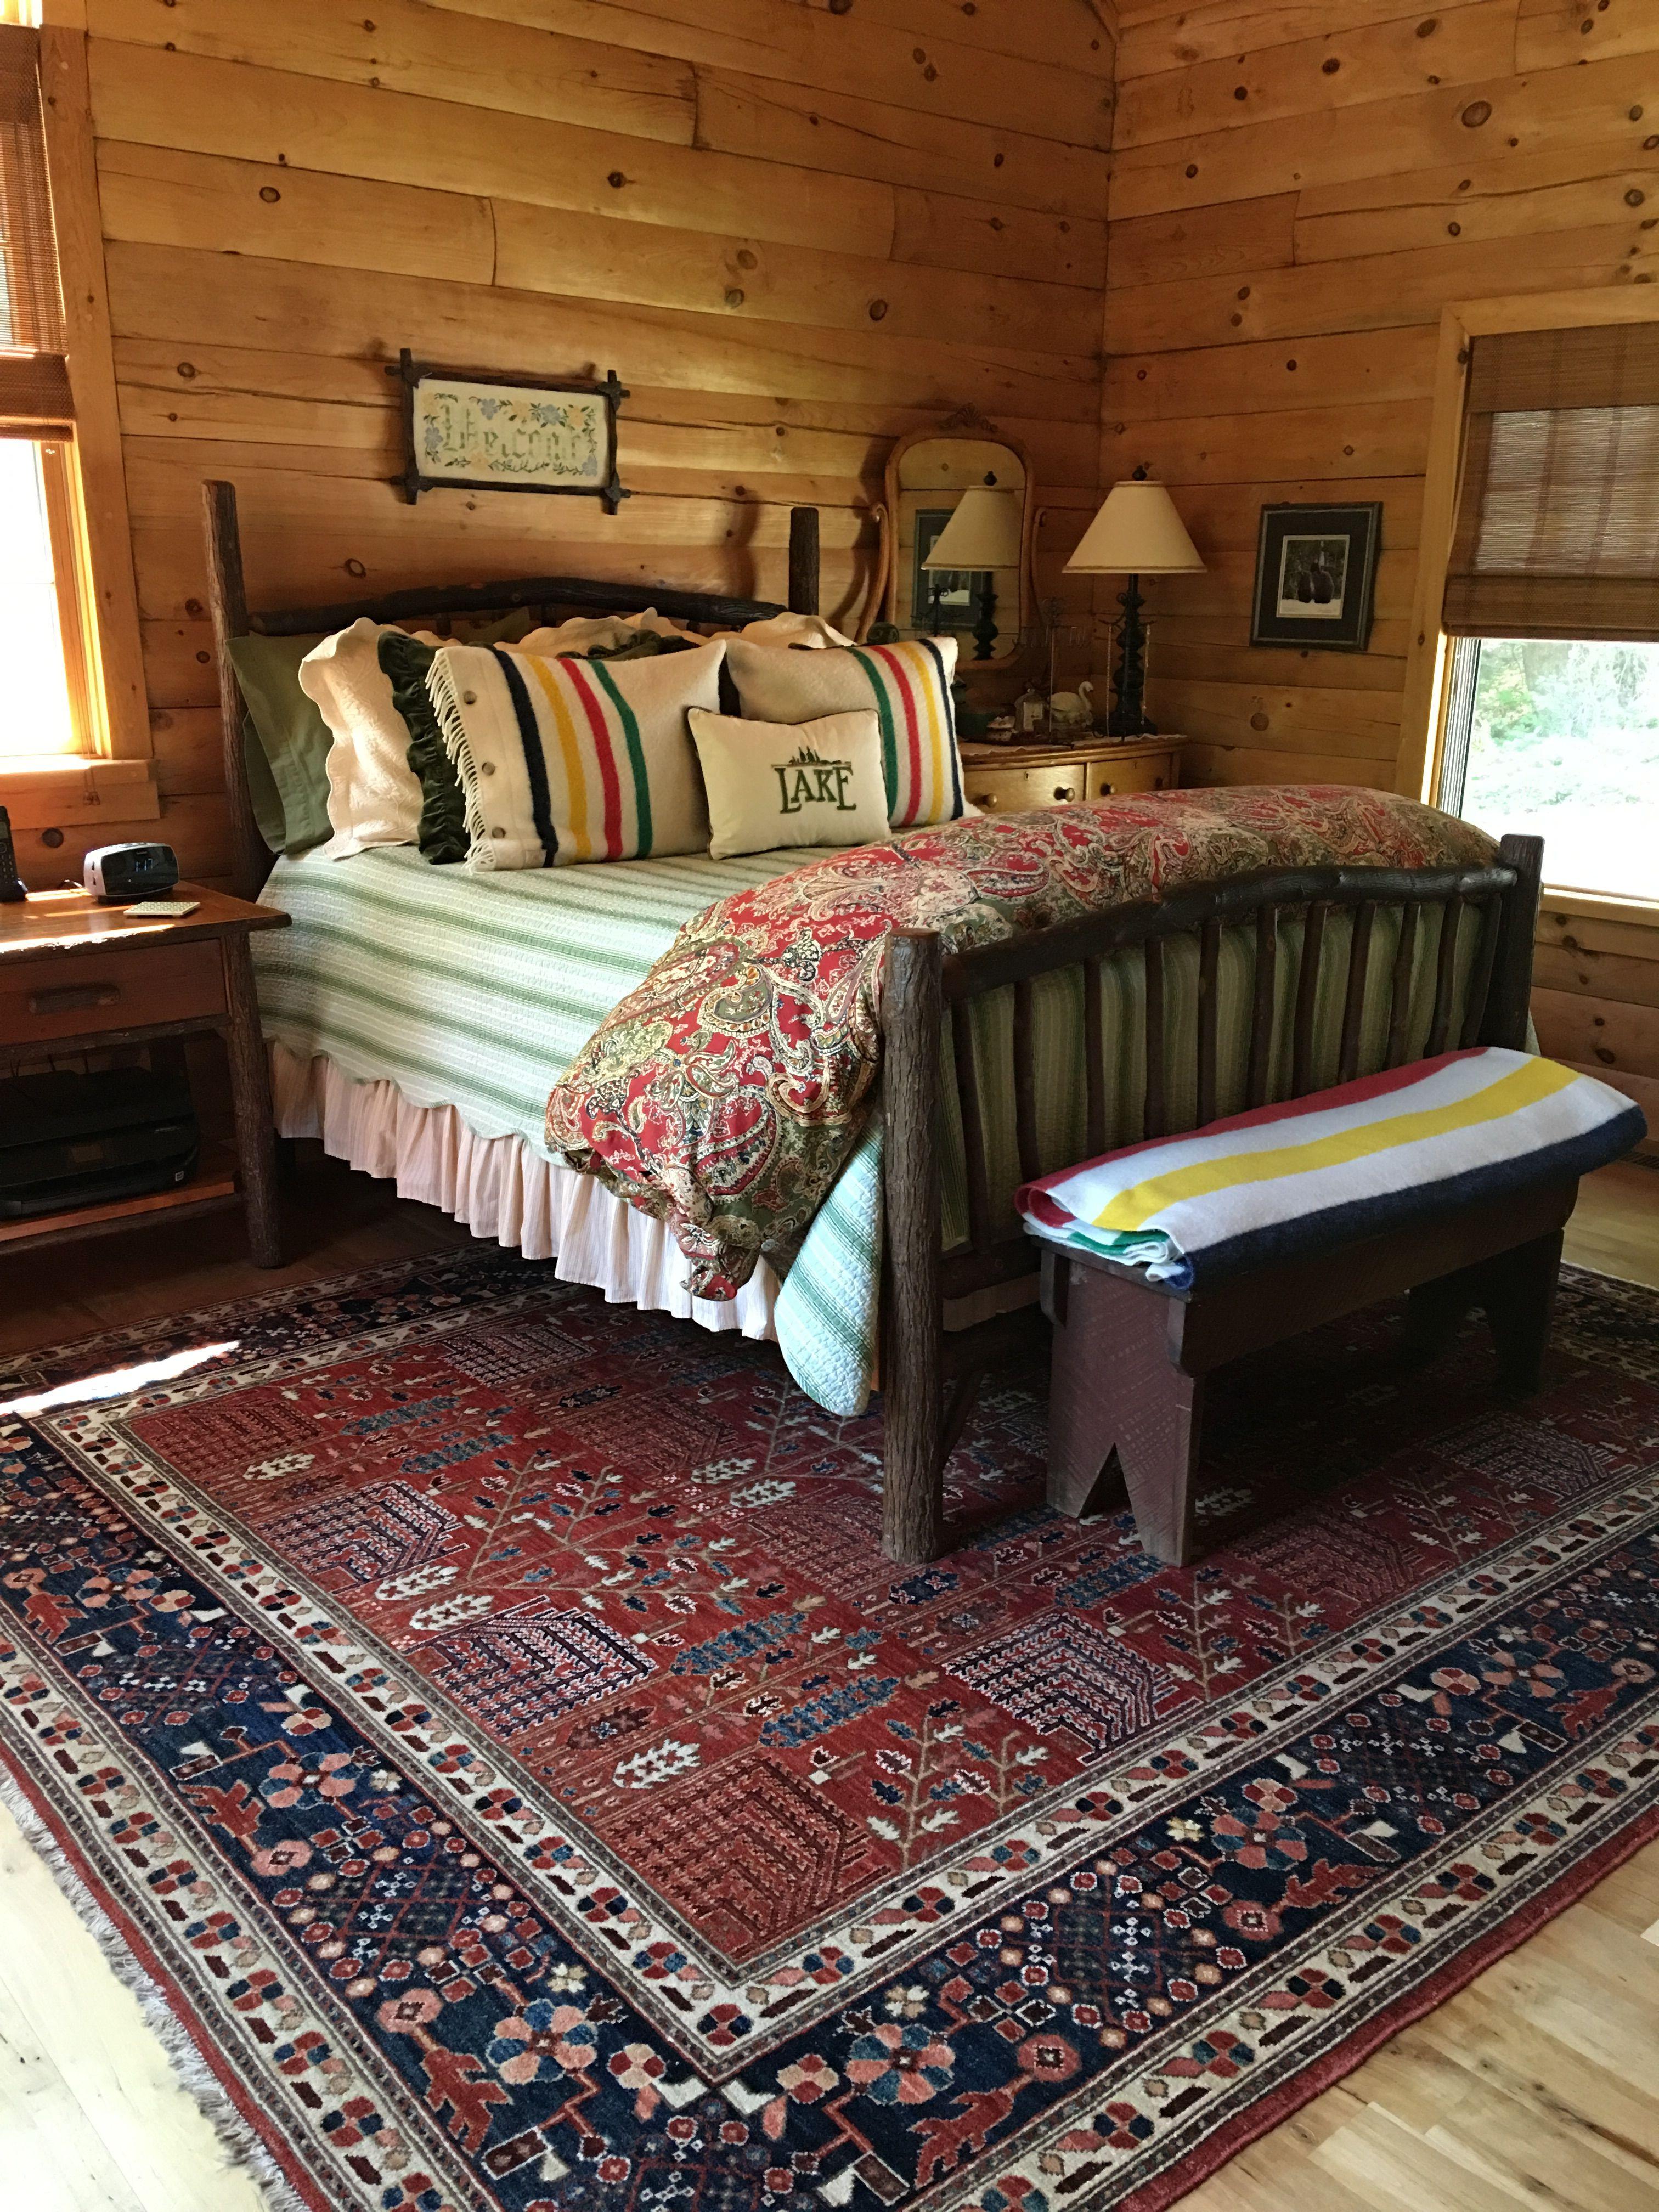 Pin by Michele Snow on Cabin Fever | Dream decor, Cabin ...